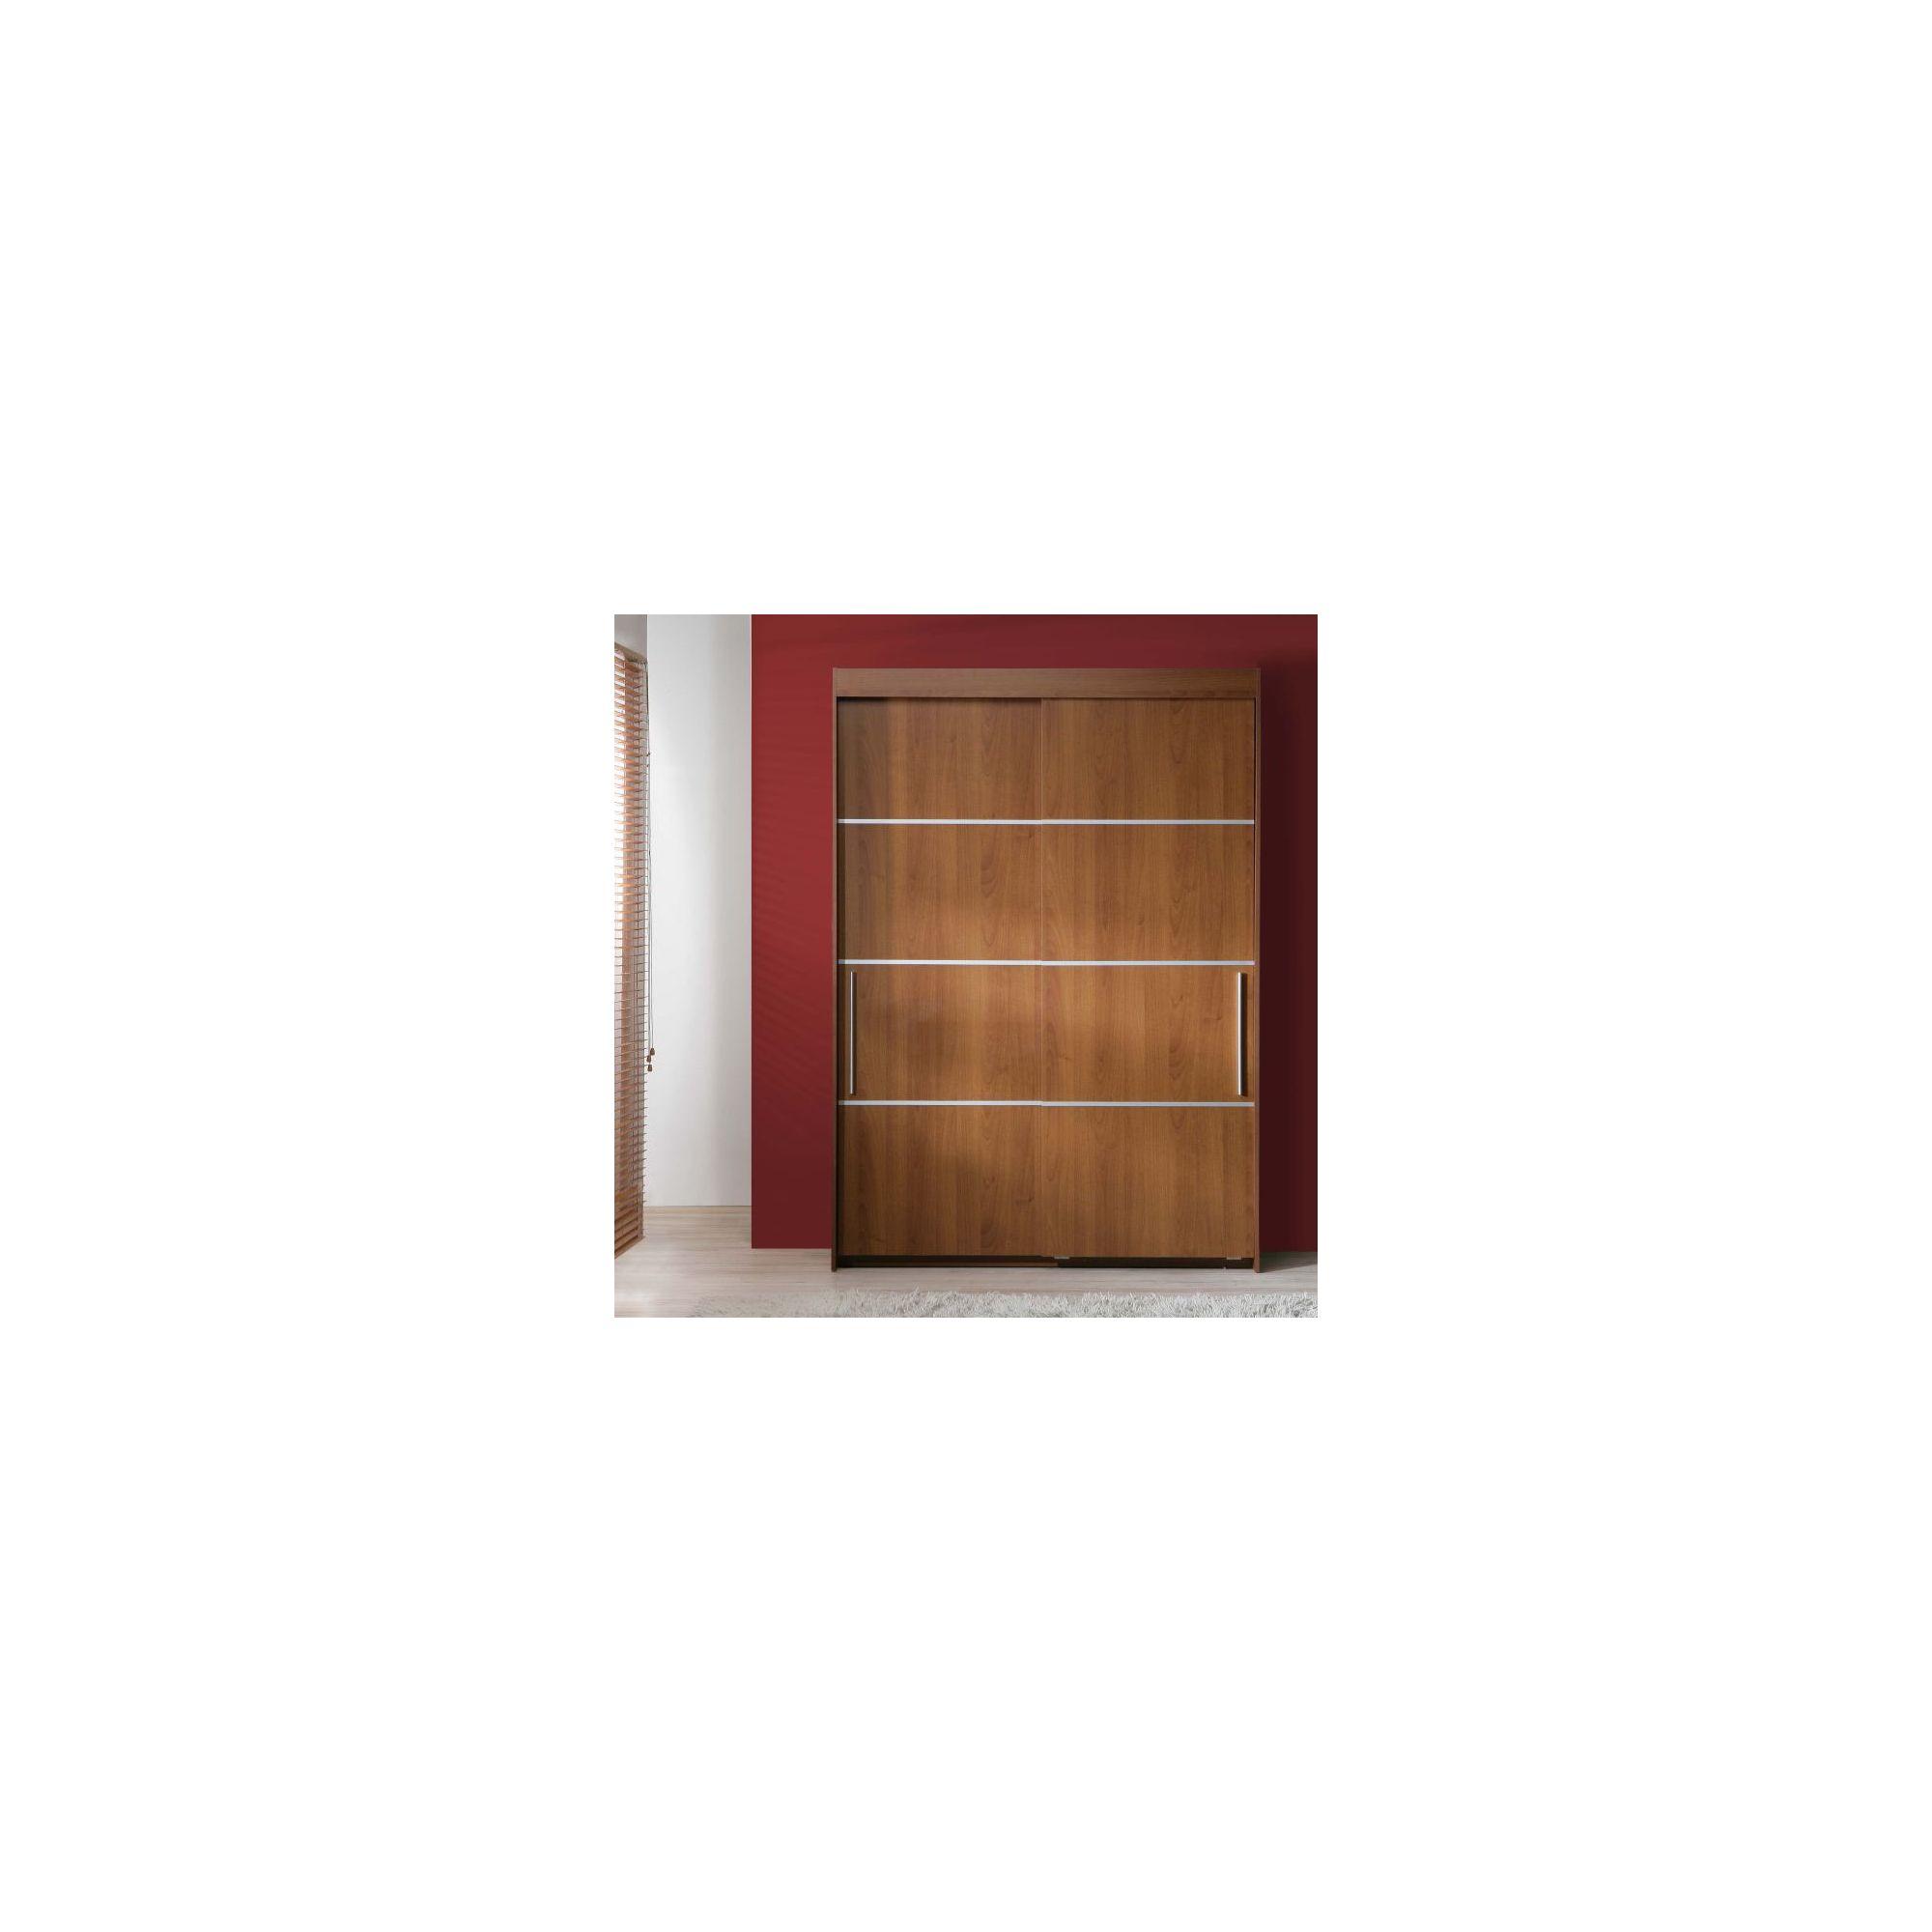 Ideal Furniture Nikko Slider Wardrobe in Walnut at Tescos Direct